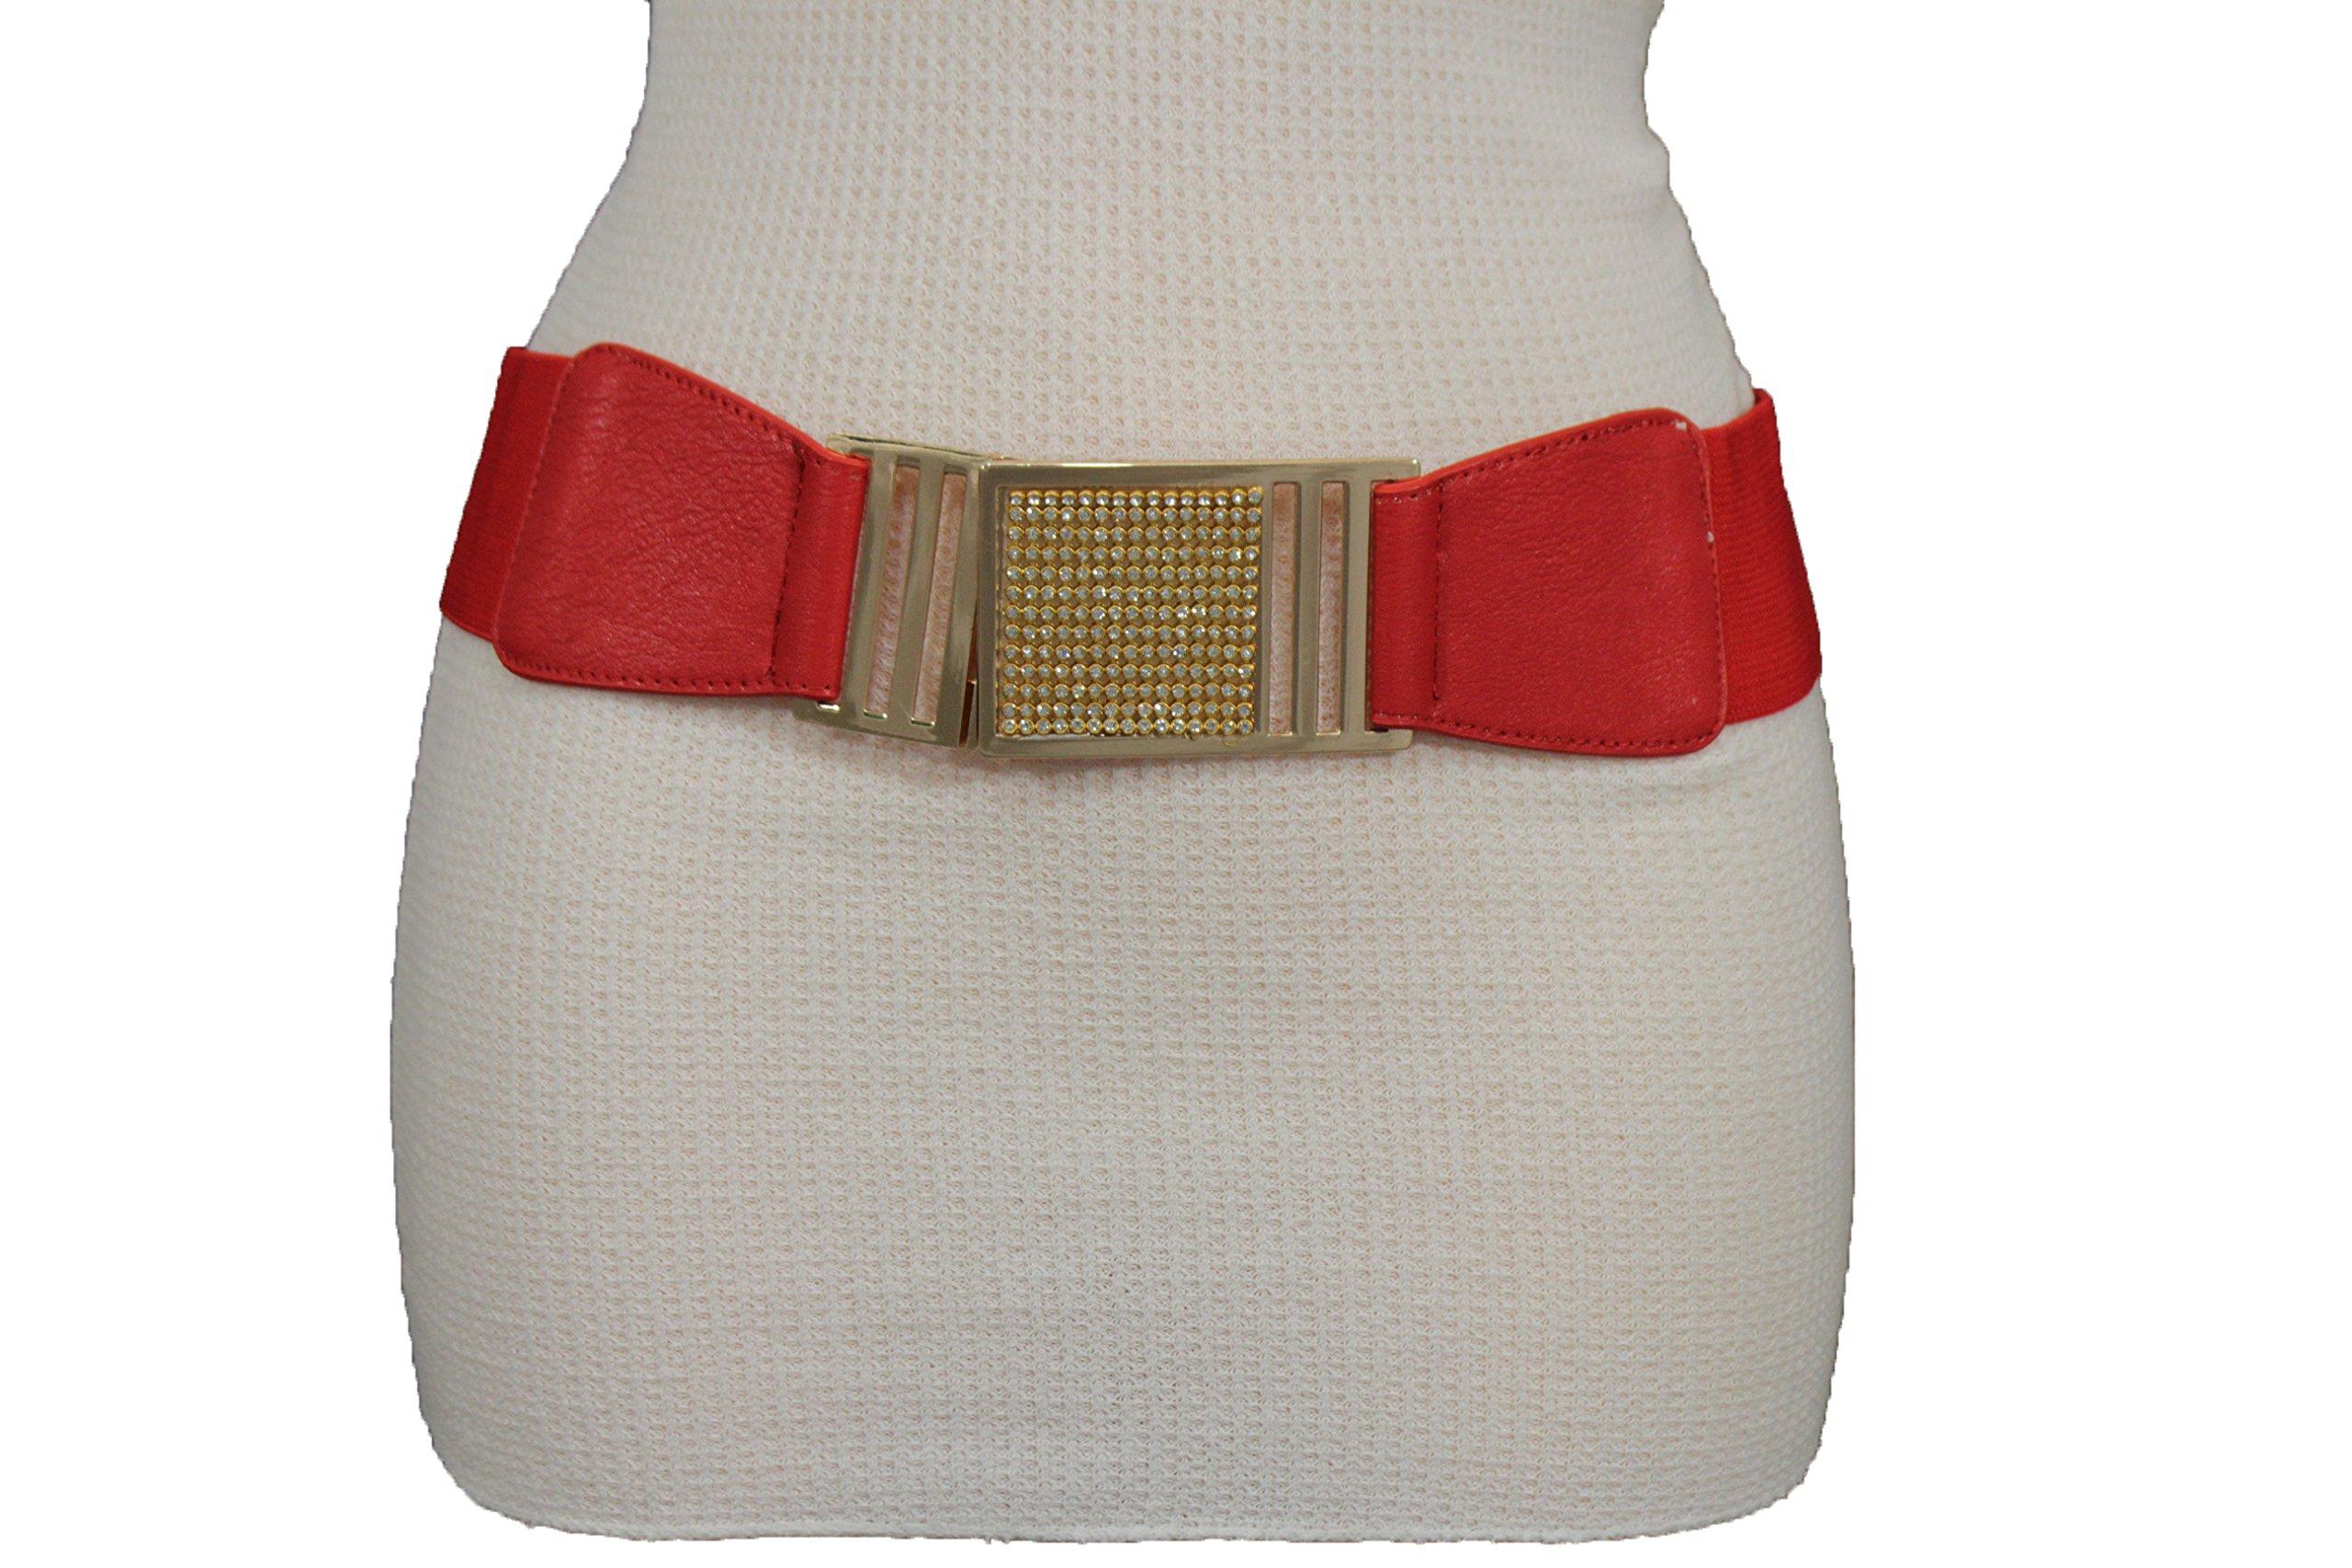 TFJ Women Fashion Elastic Belt Hip High Waist Gold Metal Buckle Plus M L XL Red